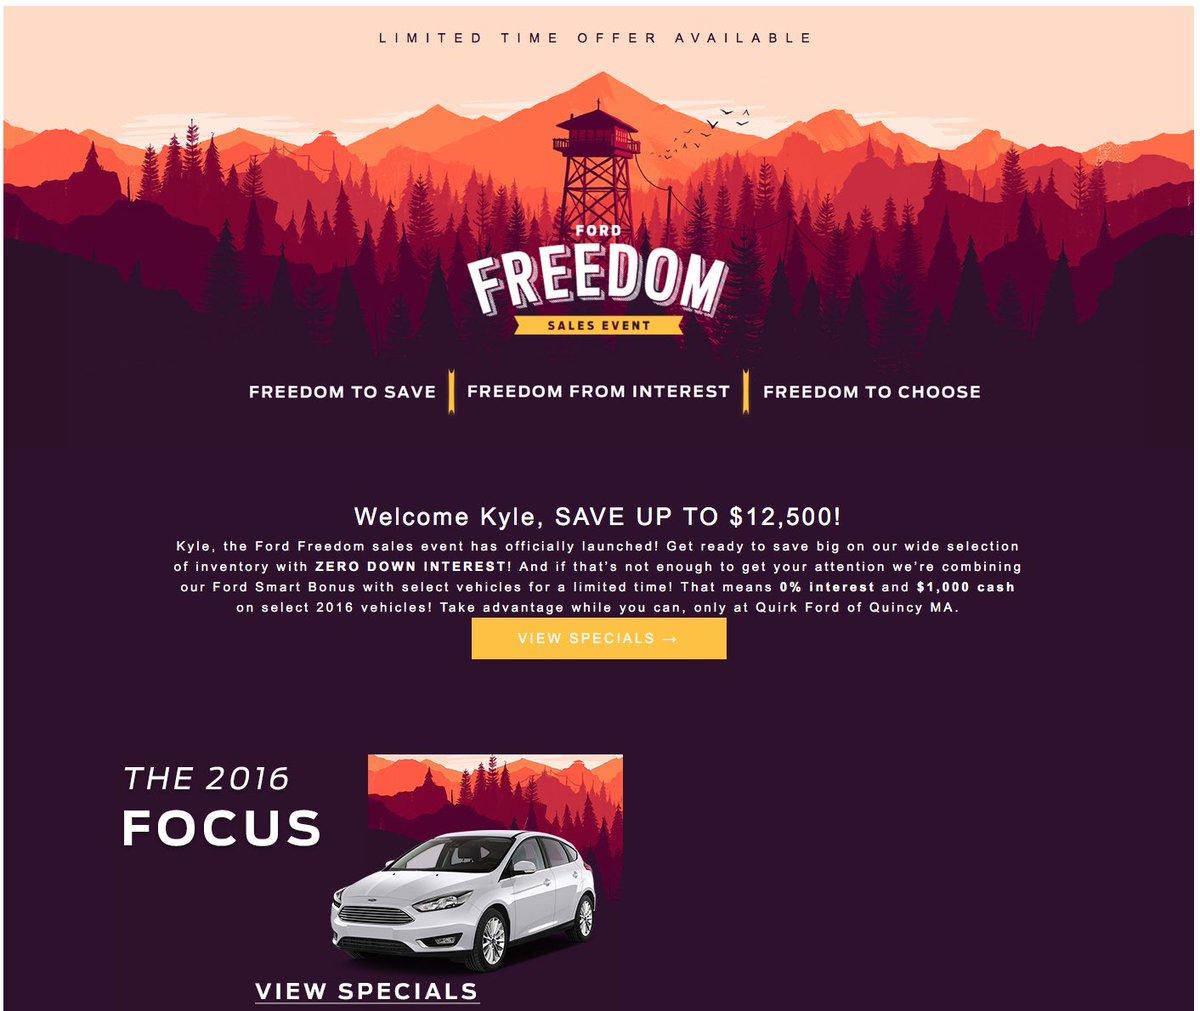 Ford freedom sales event ripoff jpg